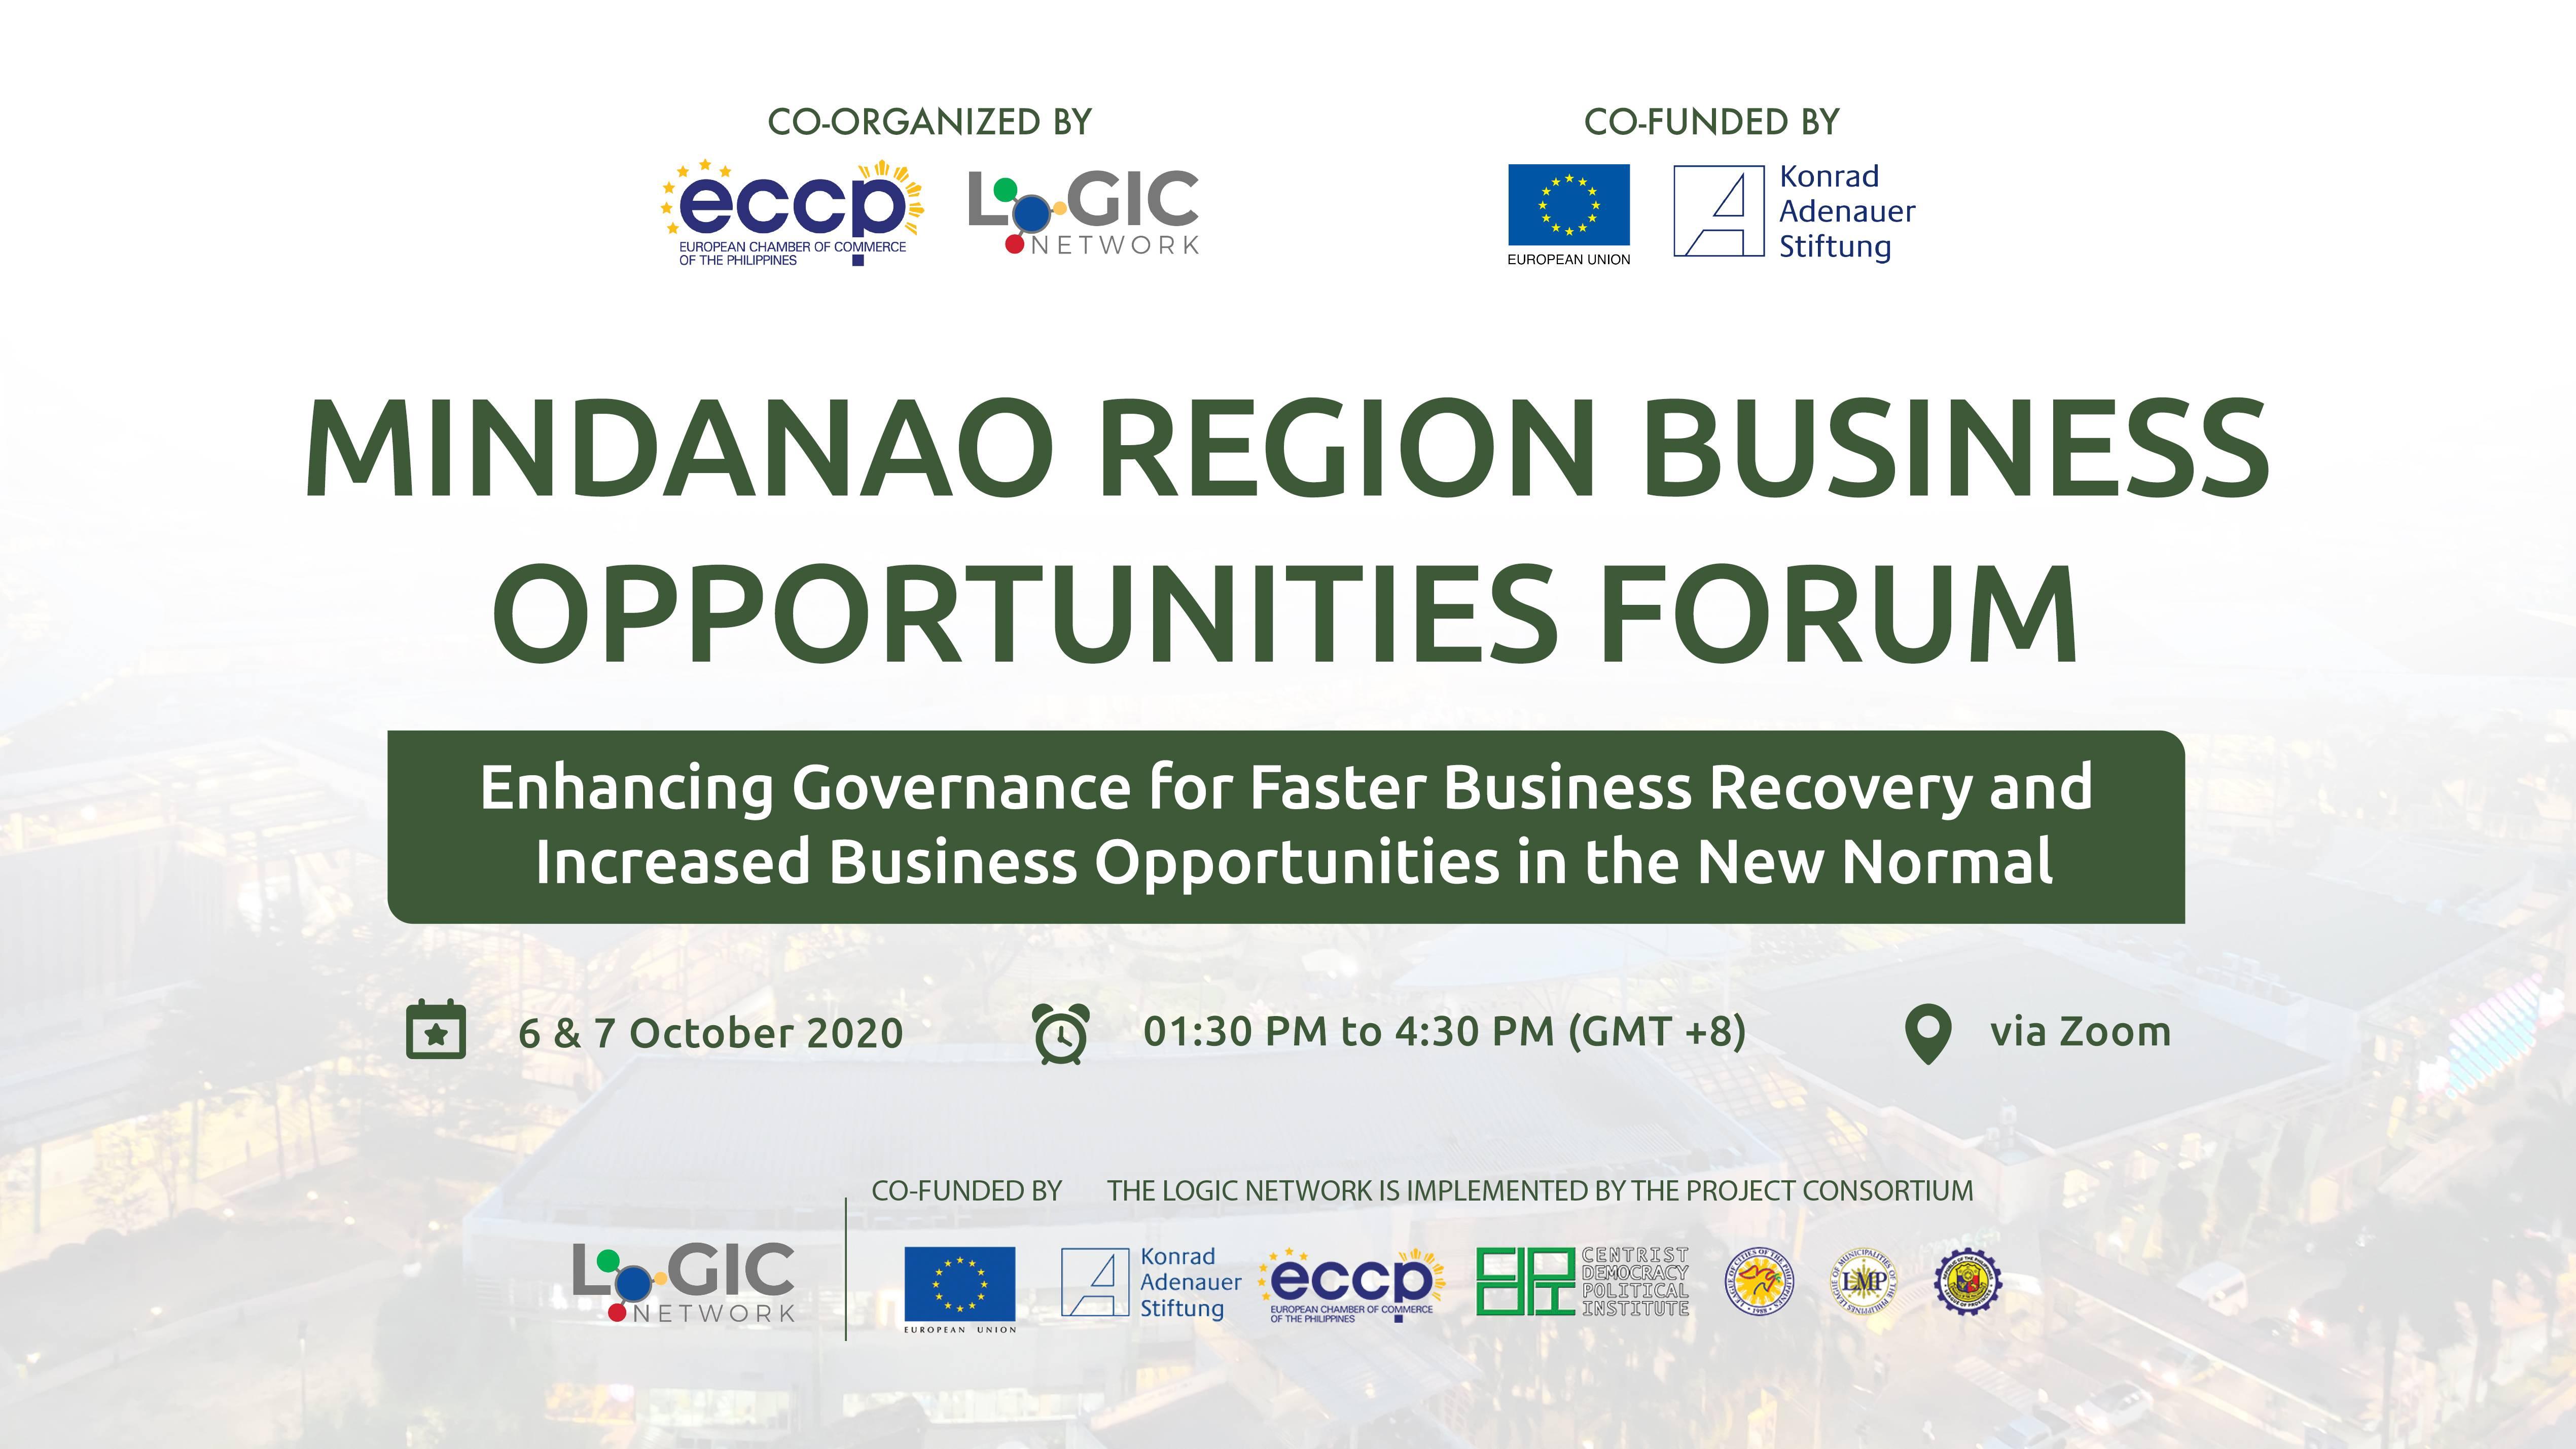 Mindanao Region Business Opportunities Forum